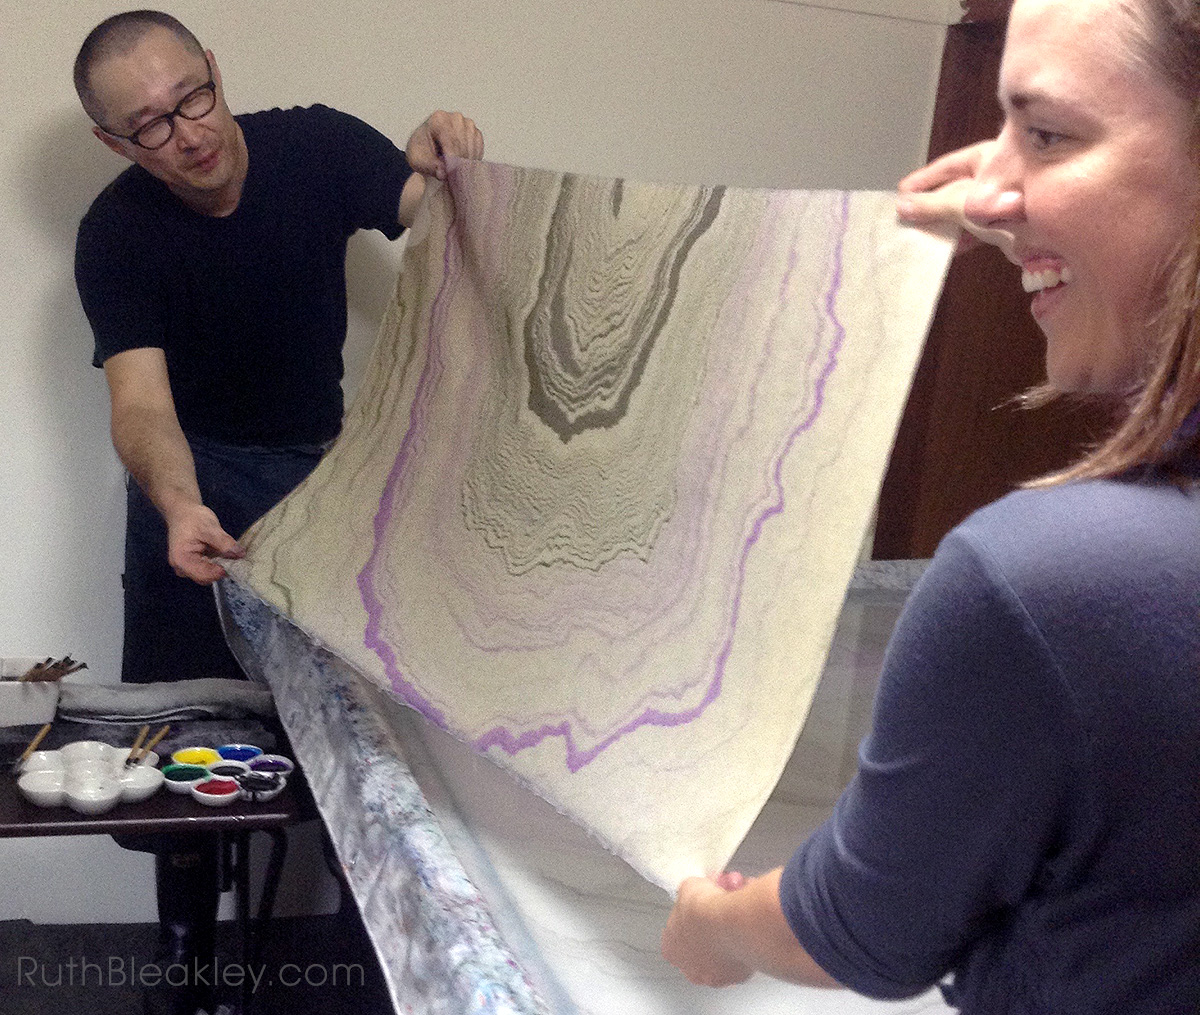 suminagashi master in Japan teaching paper marbling to book artist Ruth Bleakley